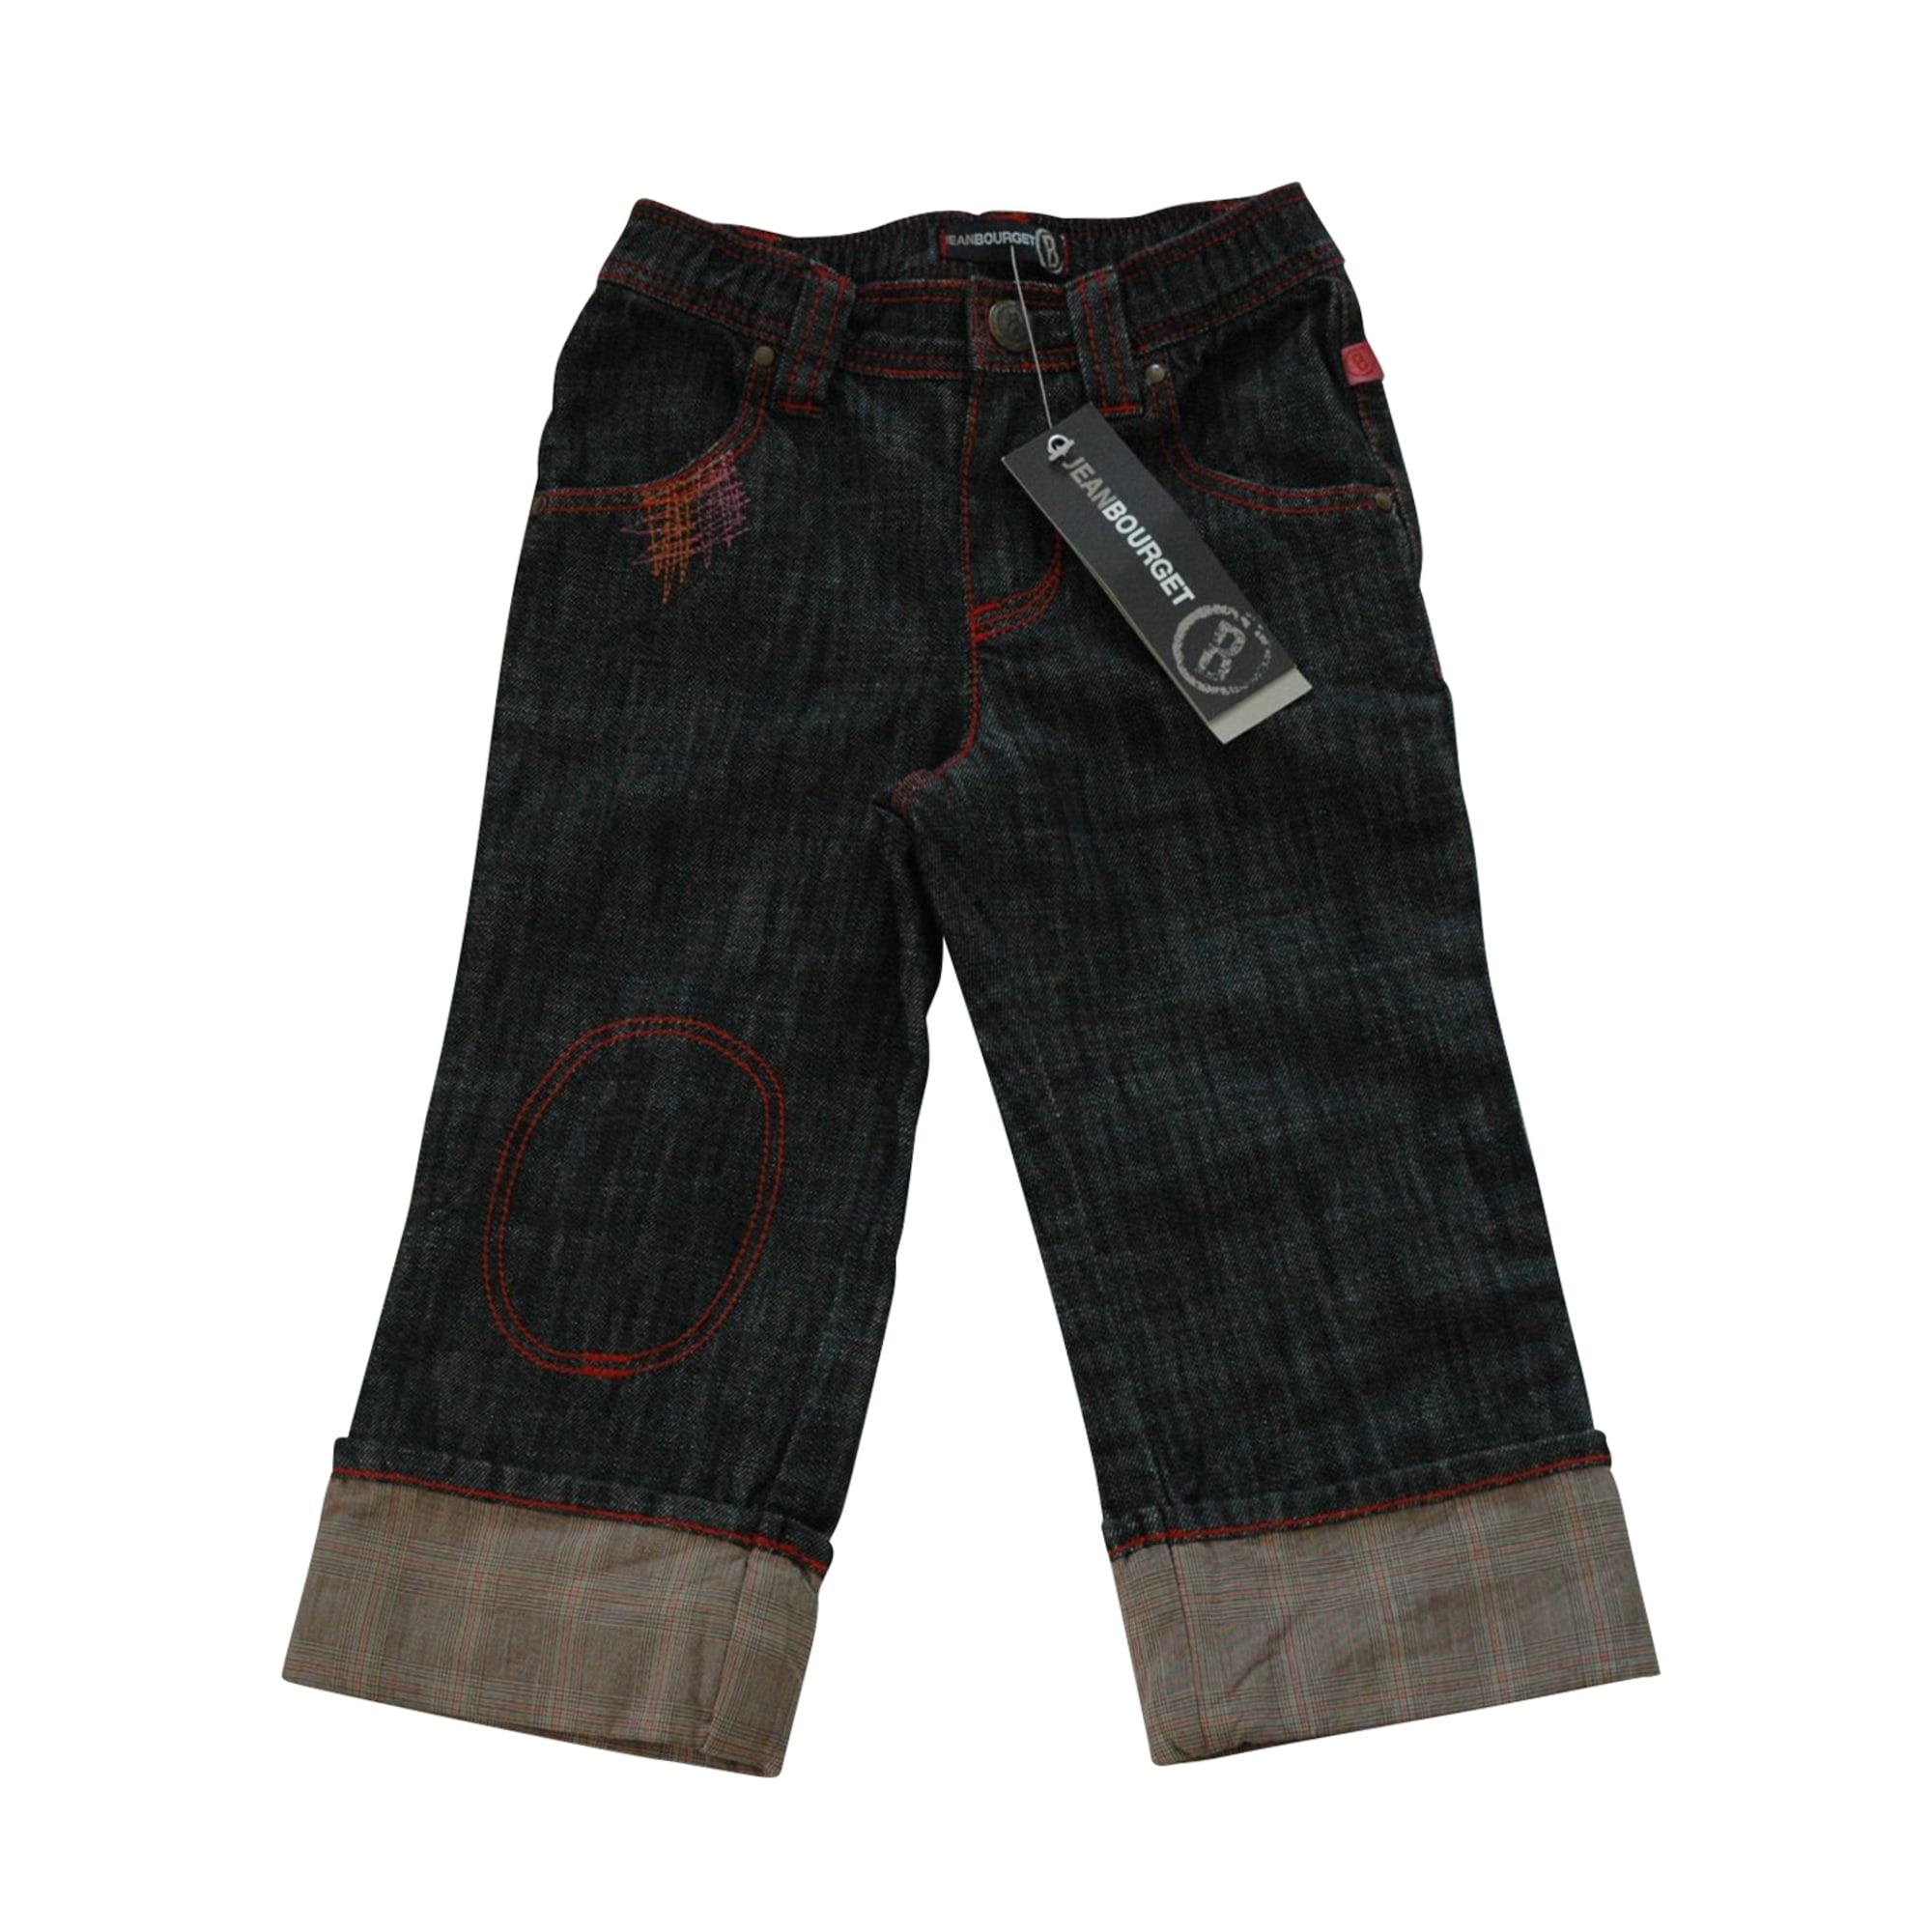 Ensemble & Combinaison pantalon JEAN BOURGET Multicouleur